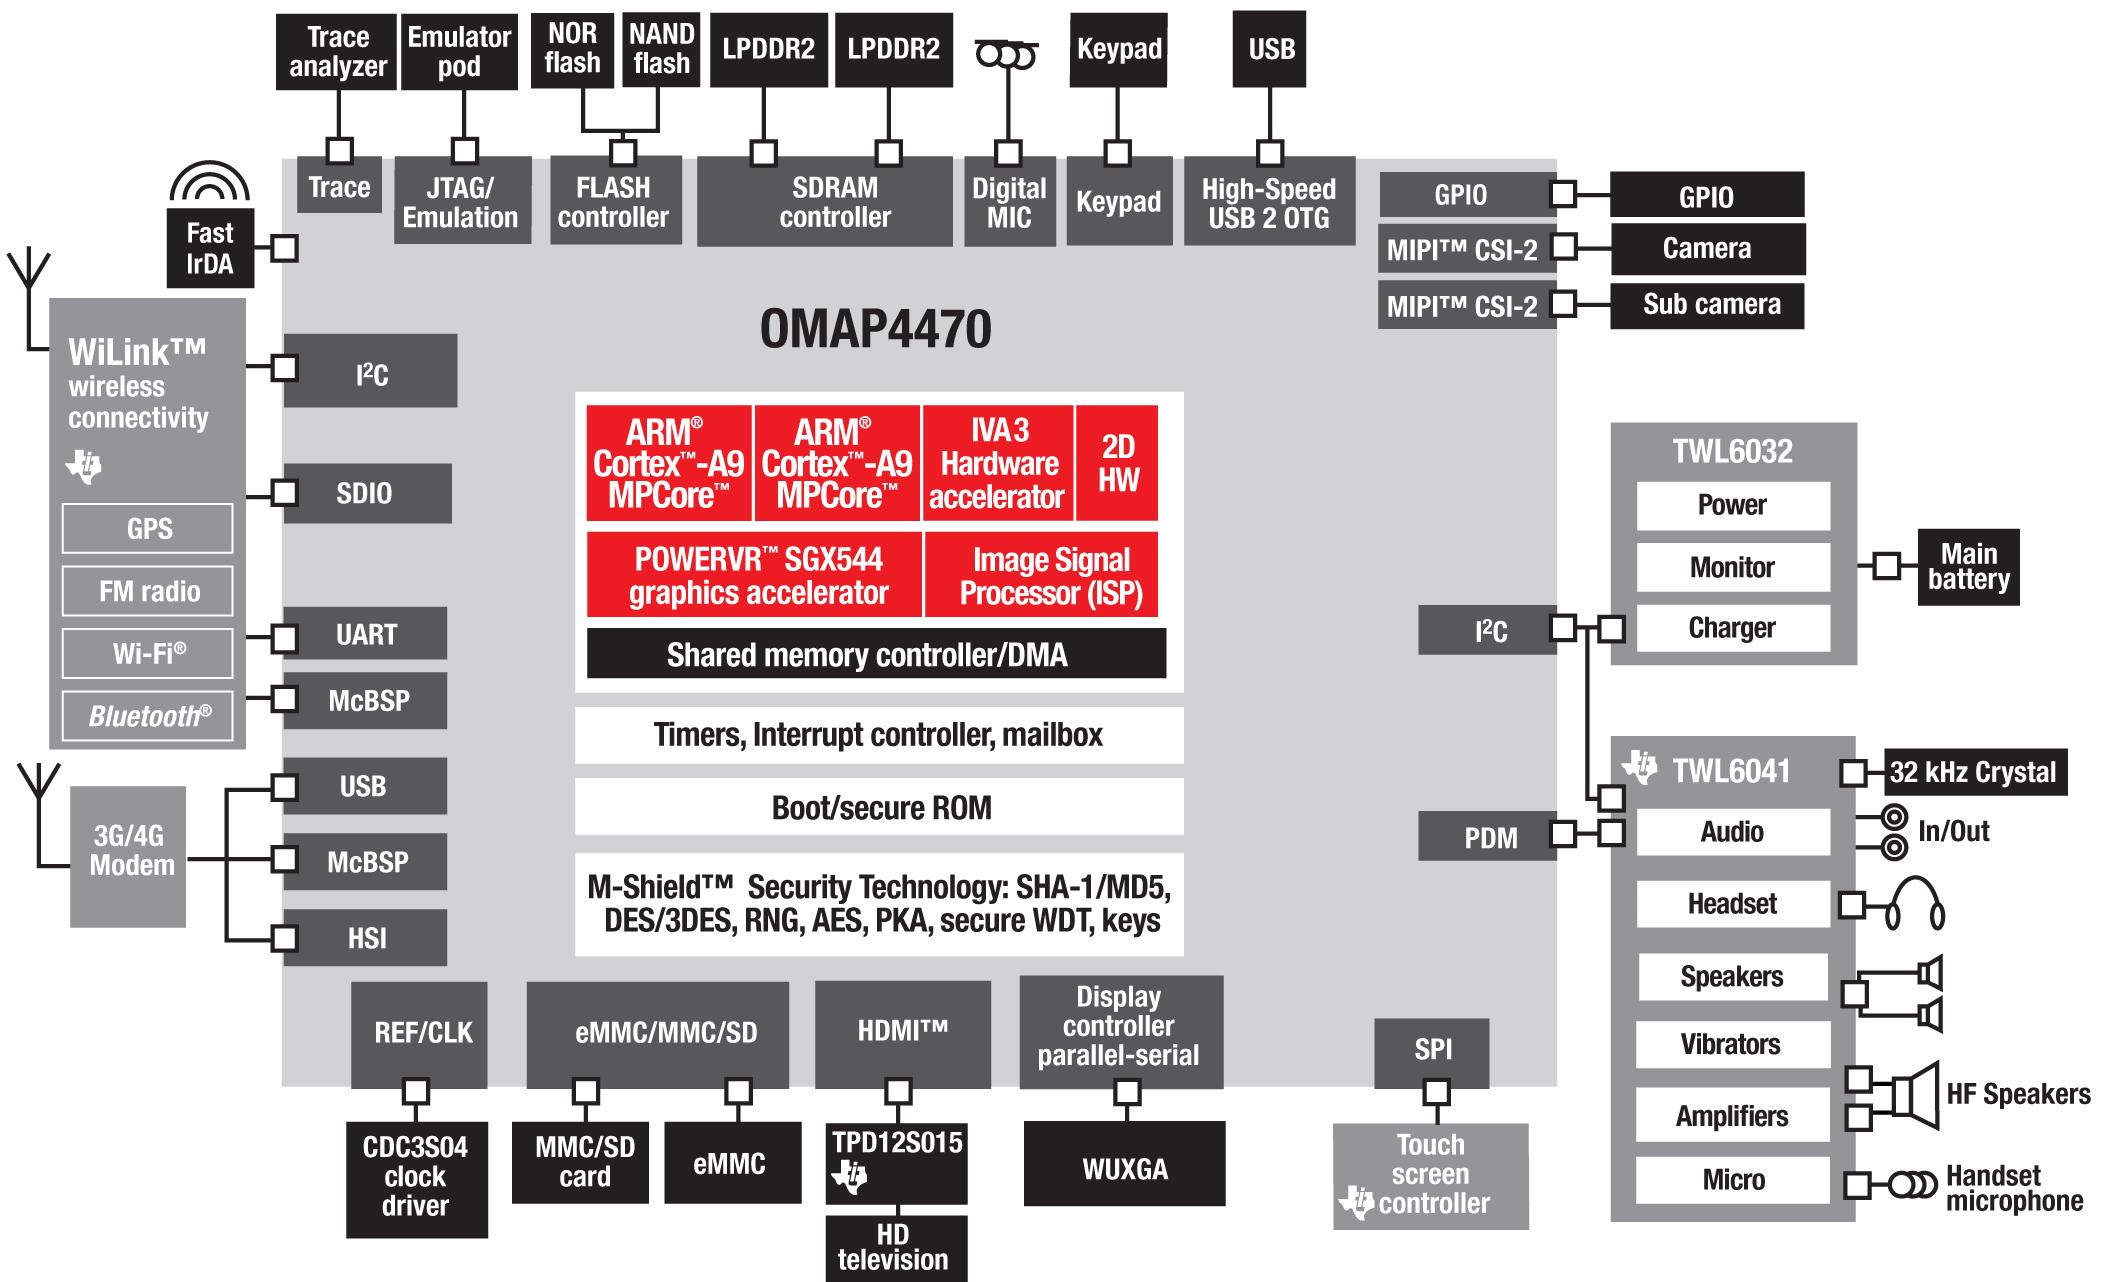 virtex 5 block diagram jacinto 5 block diagram usb 3 0 in a pc a coffee proof usb 3 0 flash drive more #4